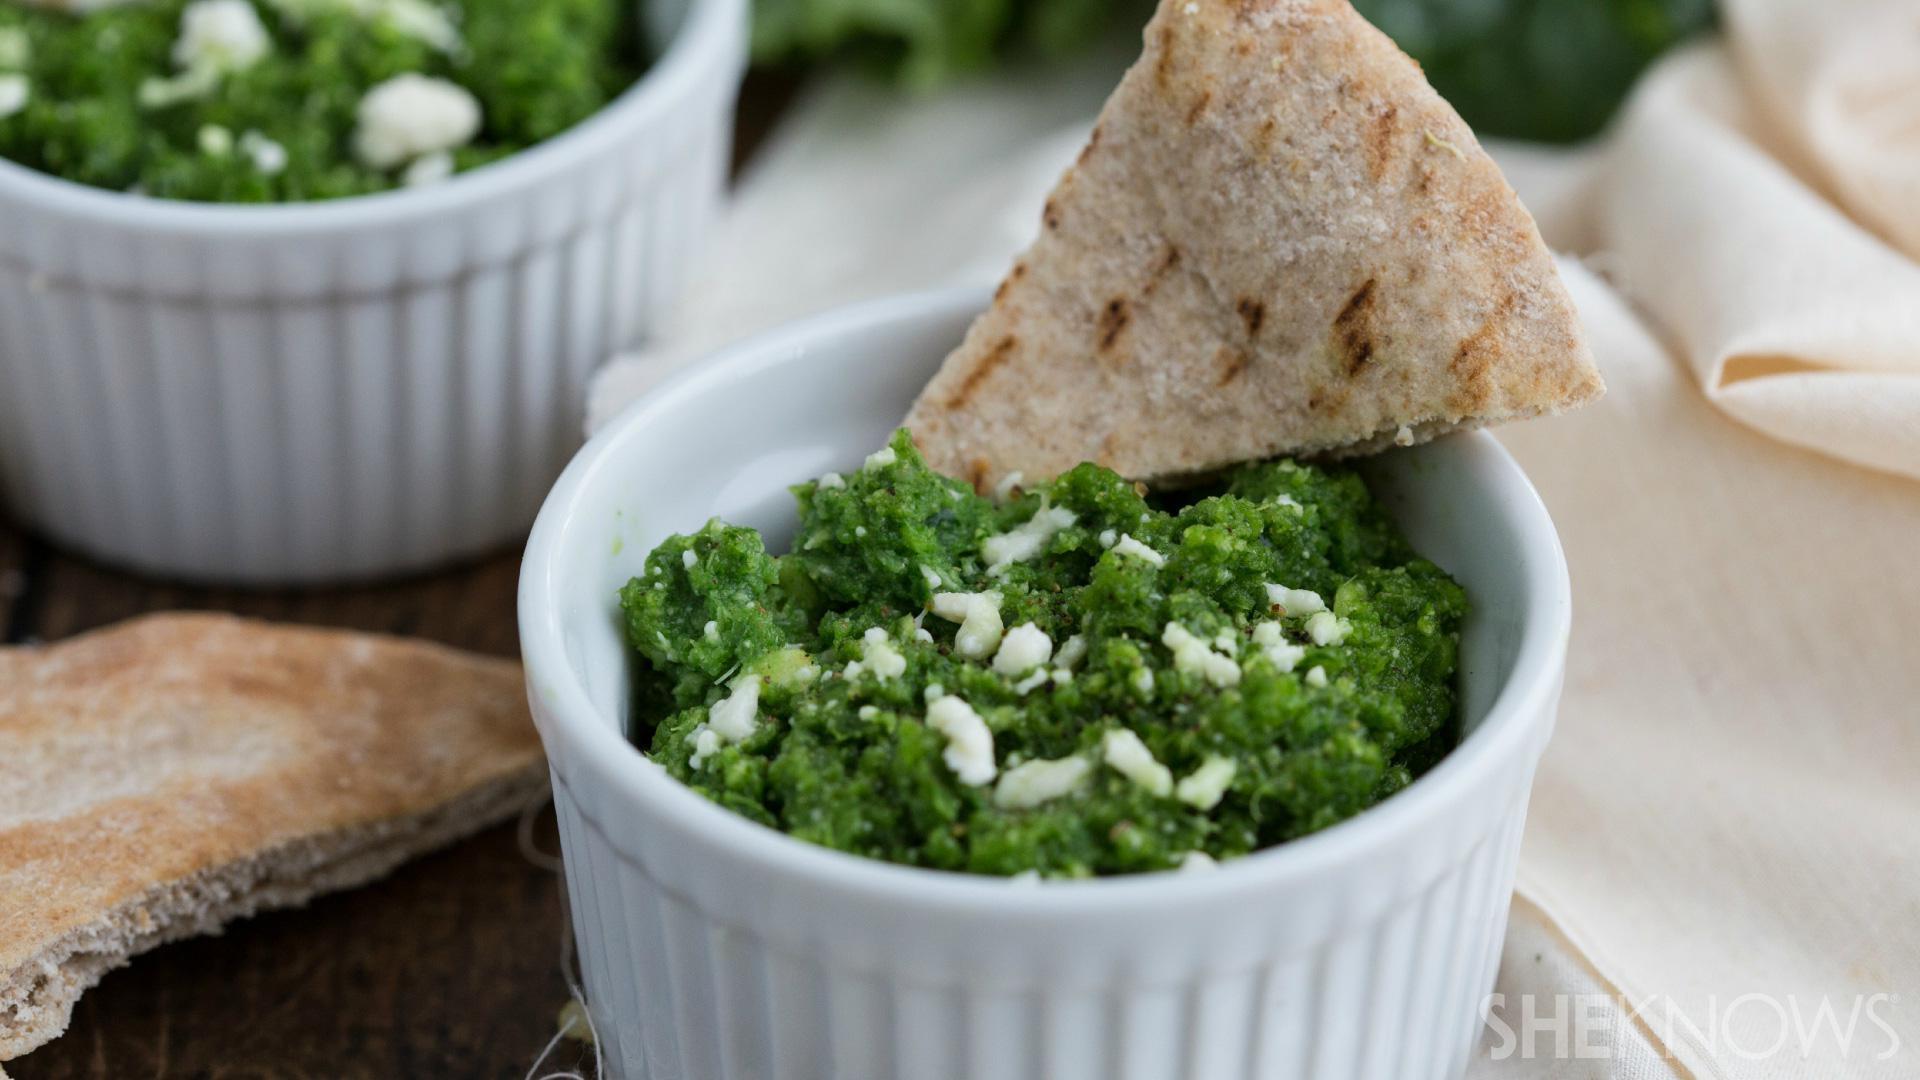 Cheesy, creamy kale dip with pita bread